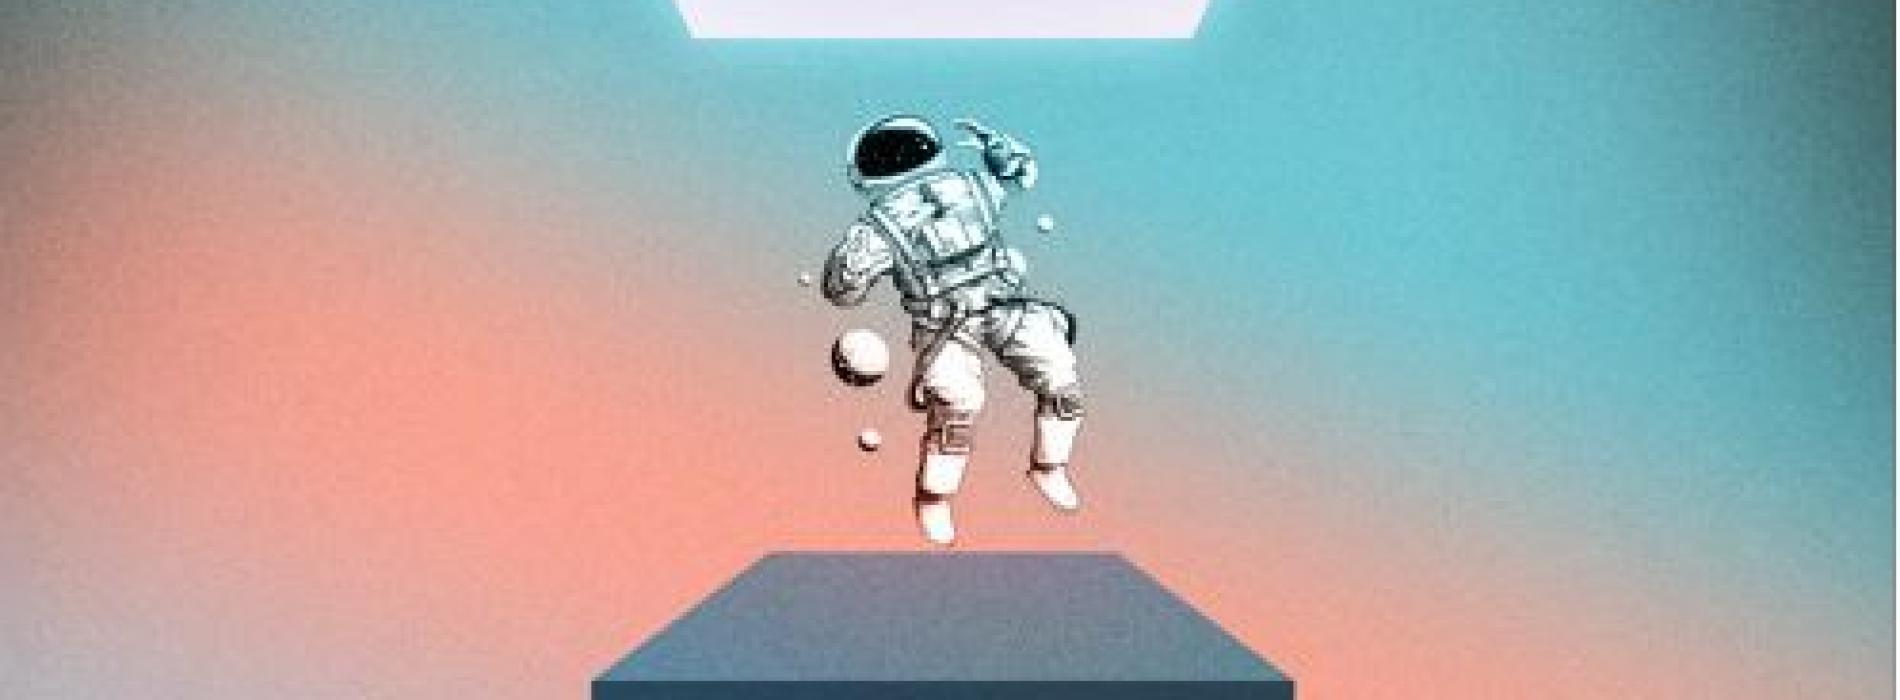 LØ – DØ (feat Fenris)(Extended Mix)